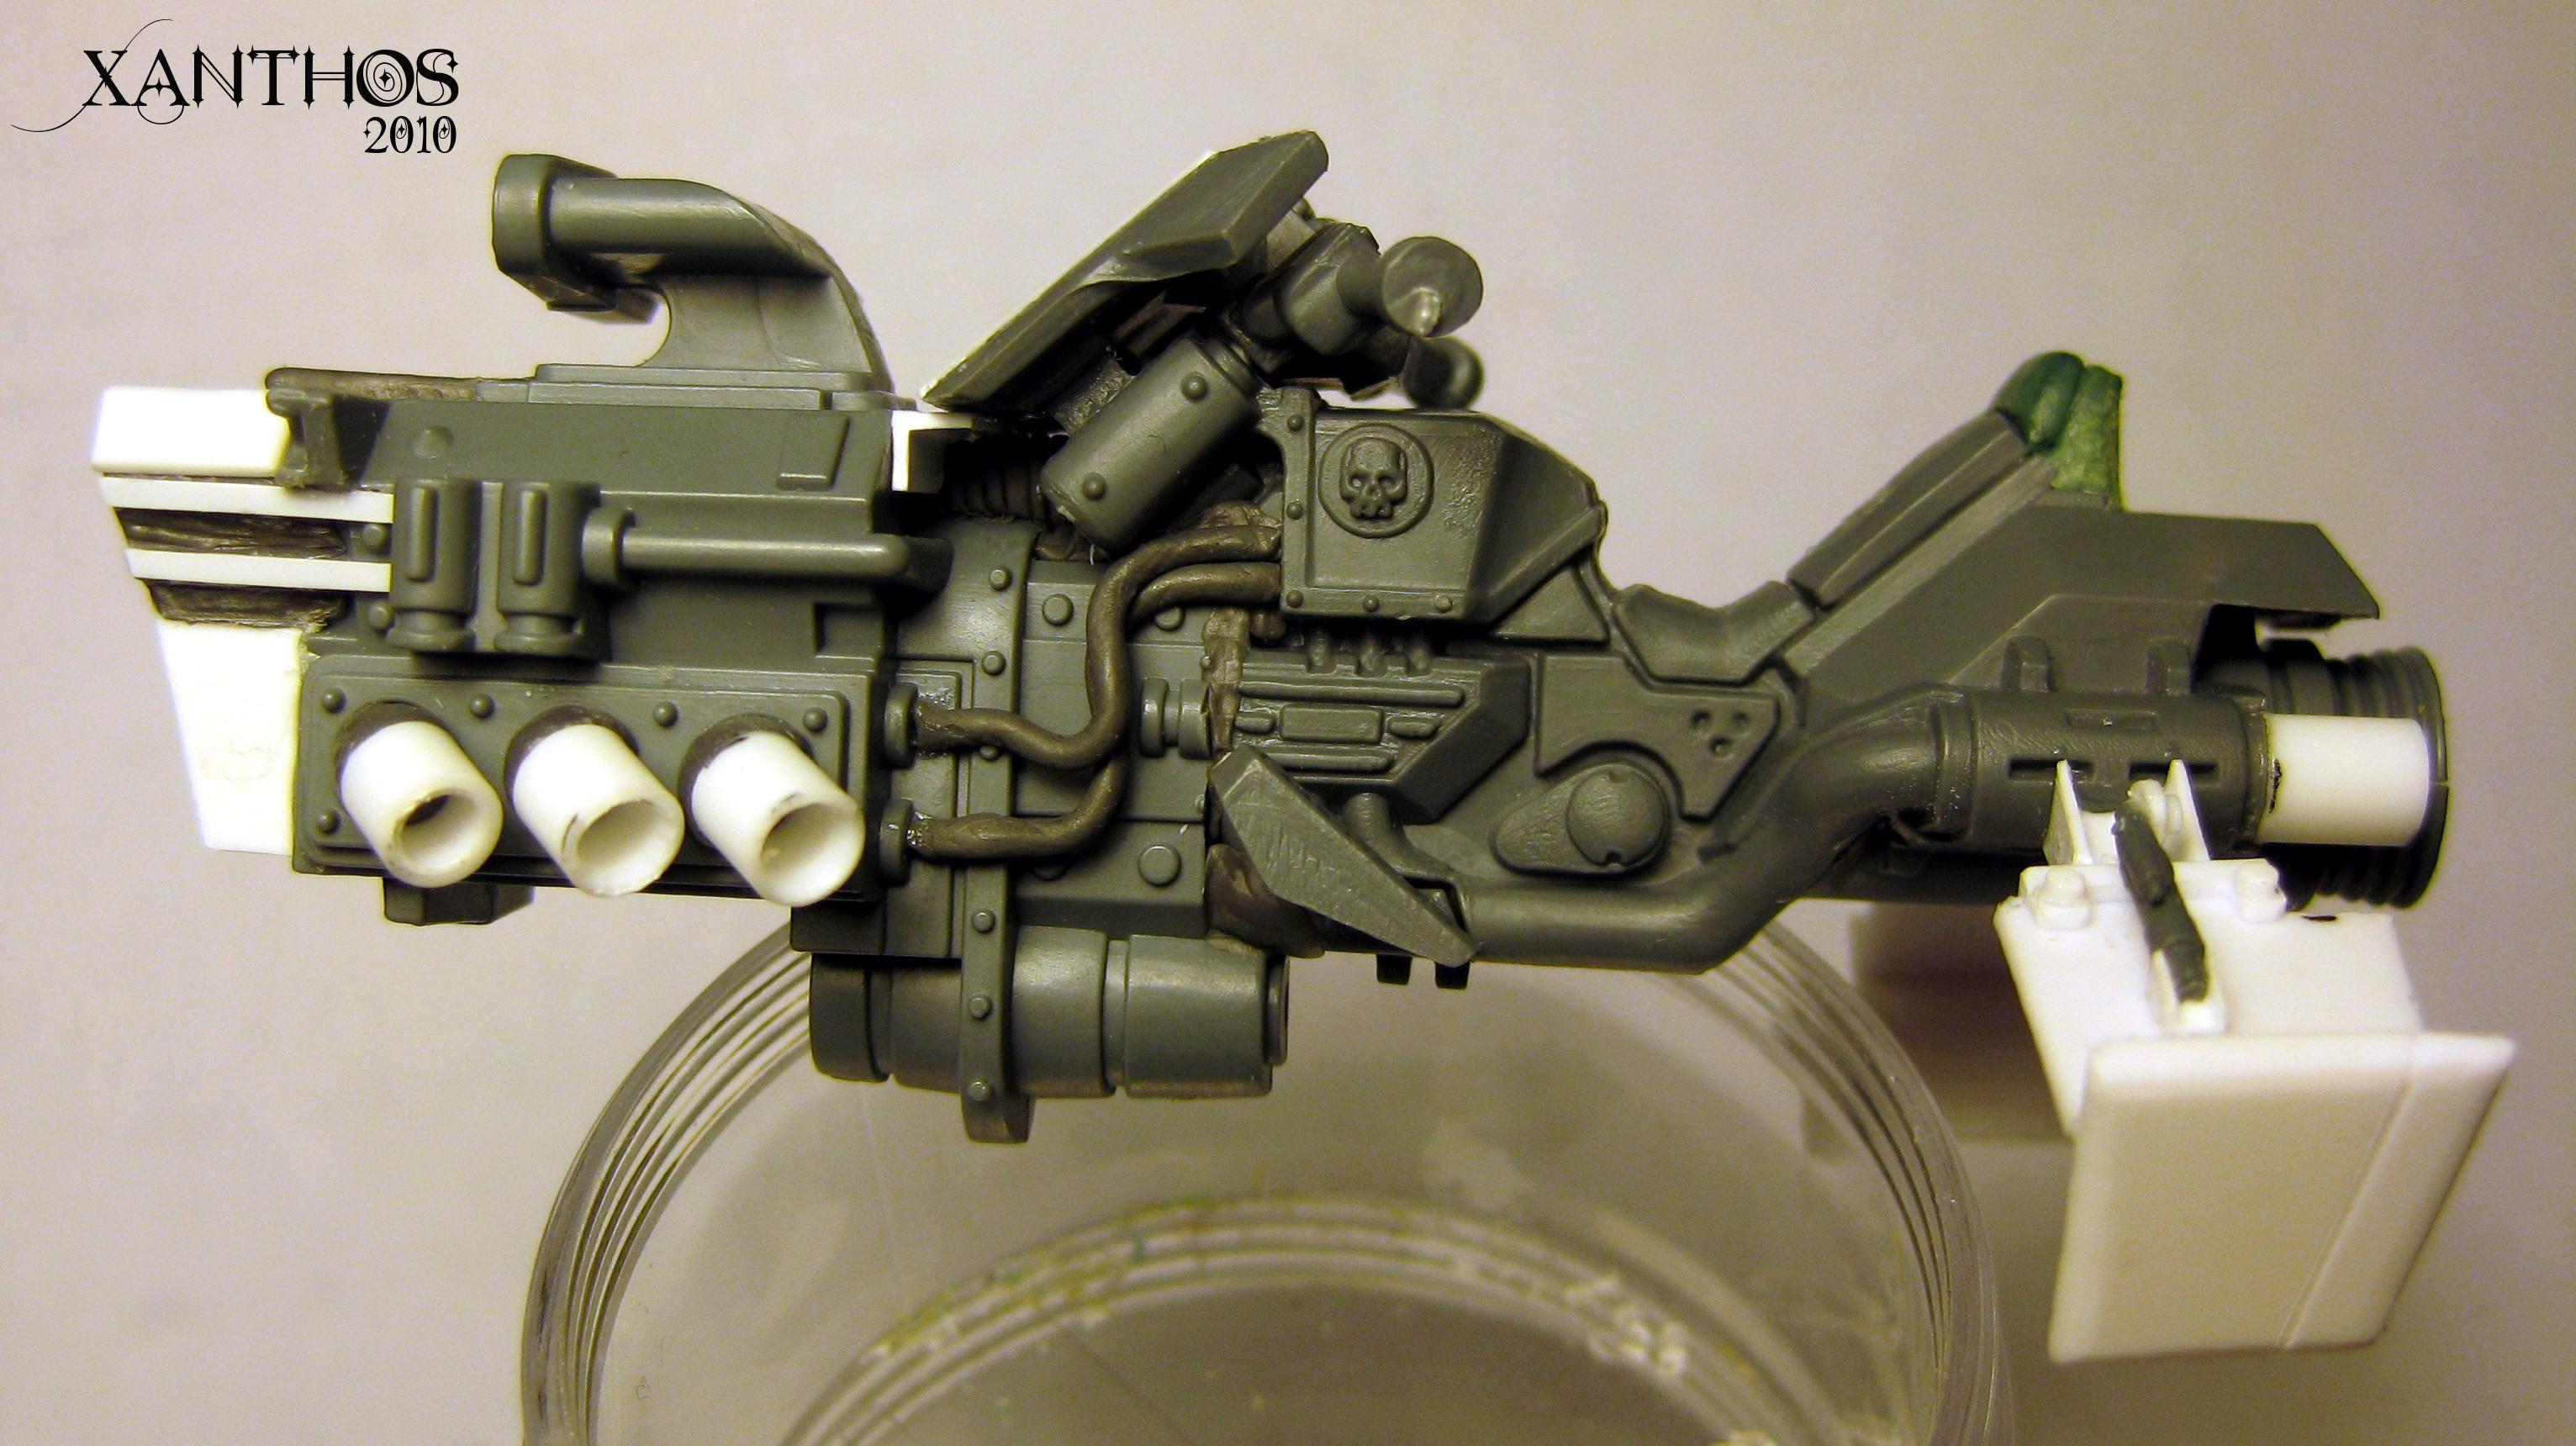 Imperial, Jetbike, Necromunda, Warhammer 40,000, Work In Progress